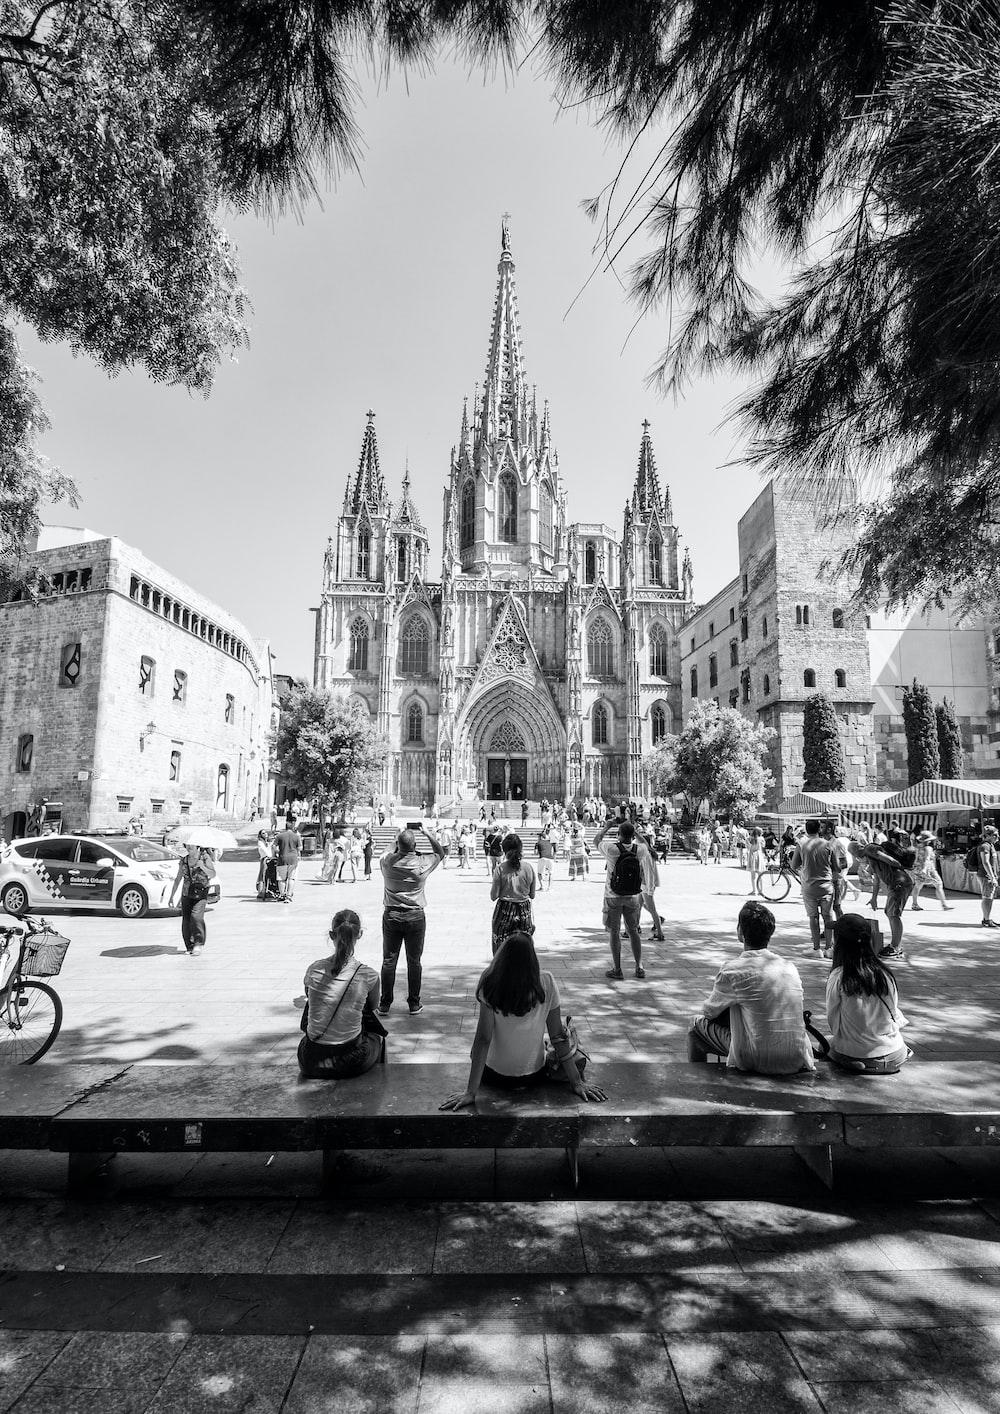 graysclae photo of people facing church